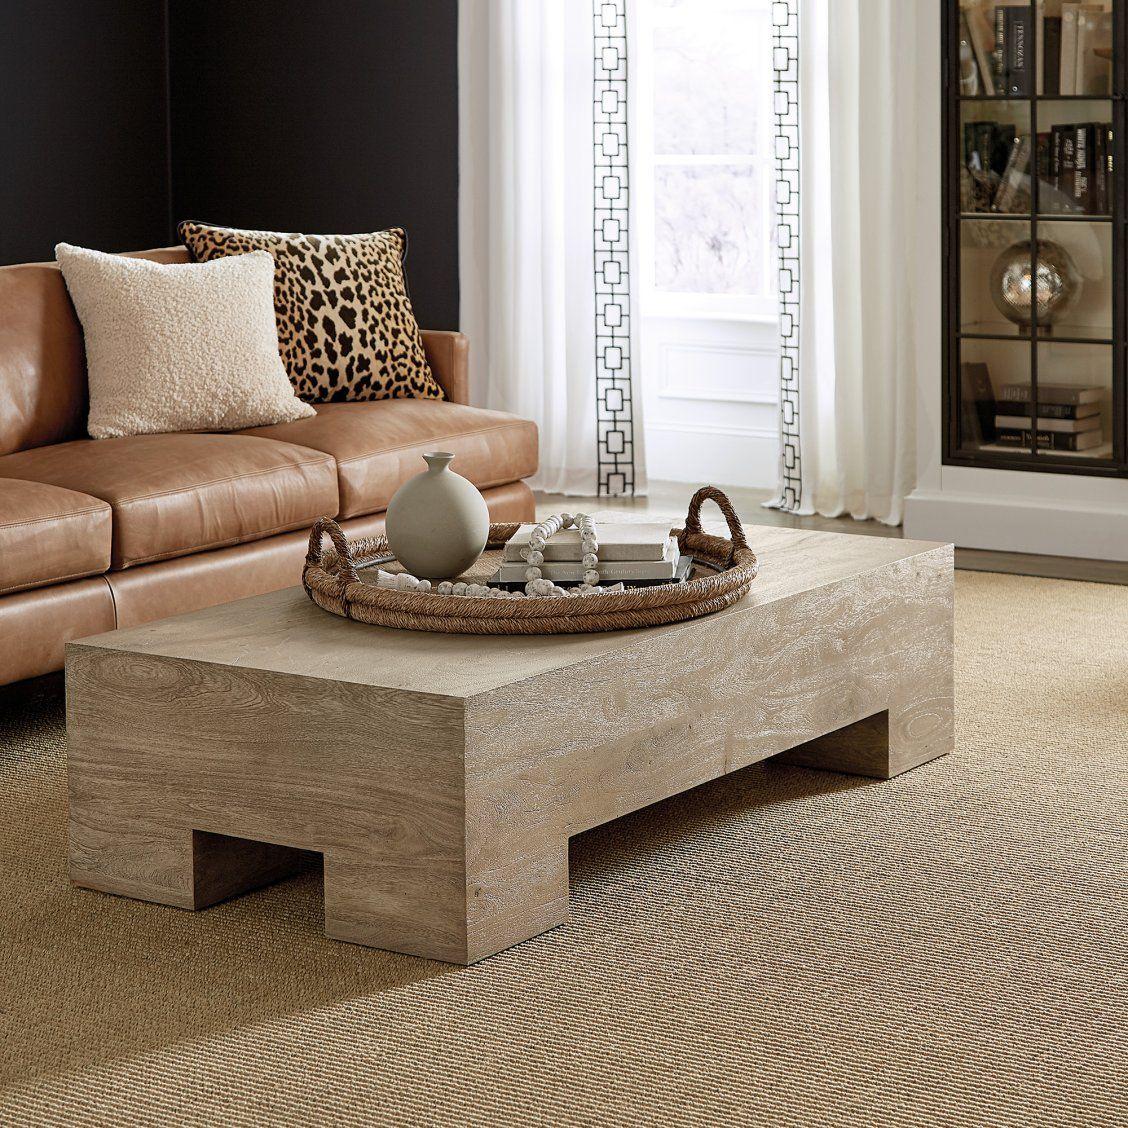 Esme Large Wood Coffee Table Coffee Table Coffee Table Wood Oversized Coffee Table [ 1128 x 1128 Pixel ]